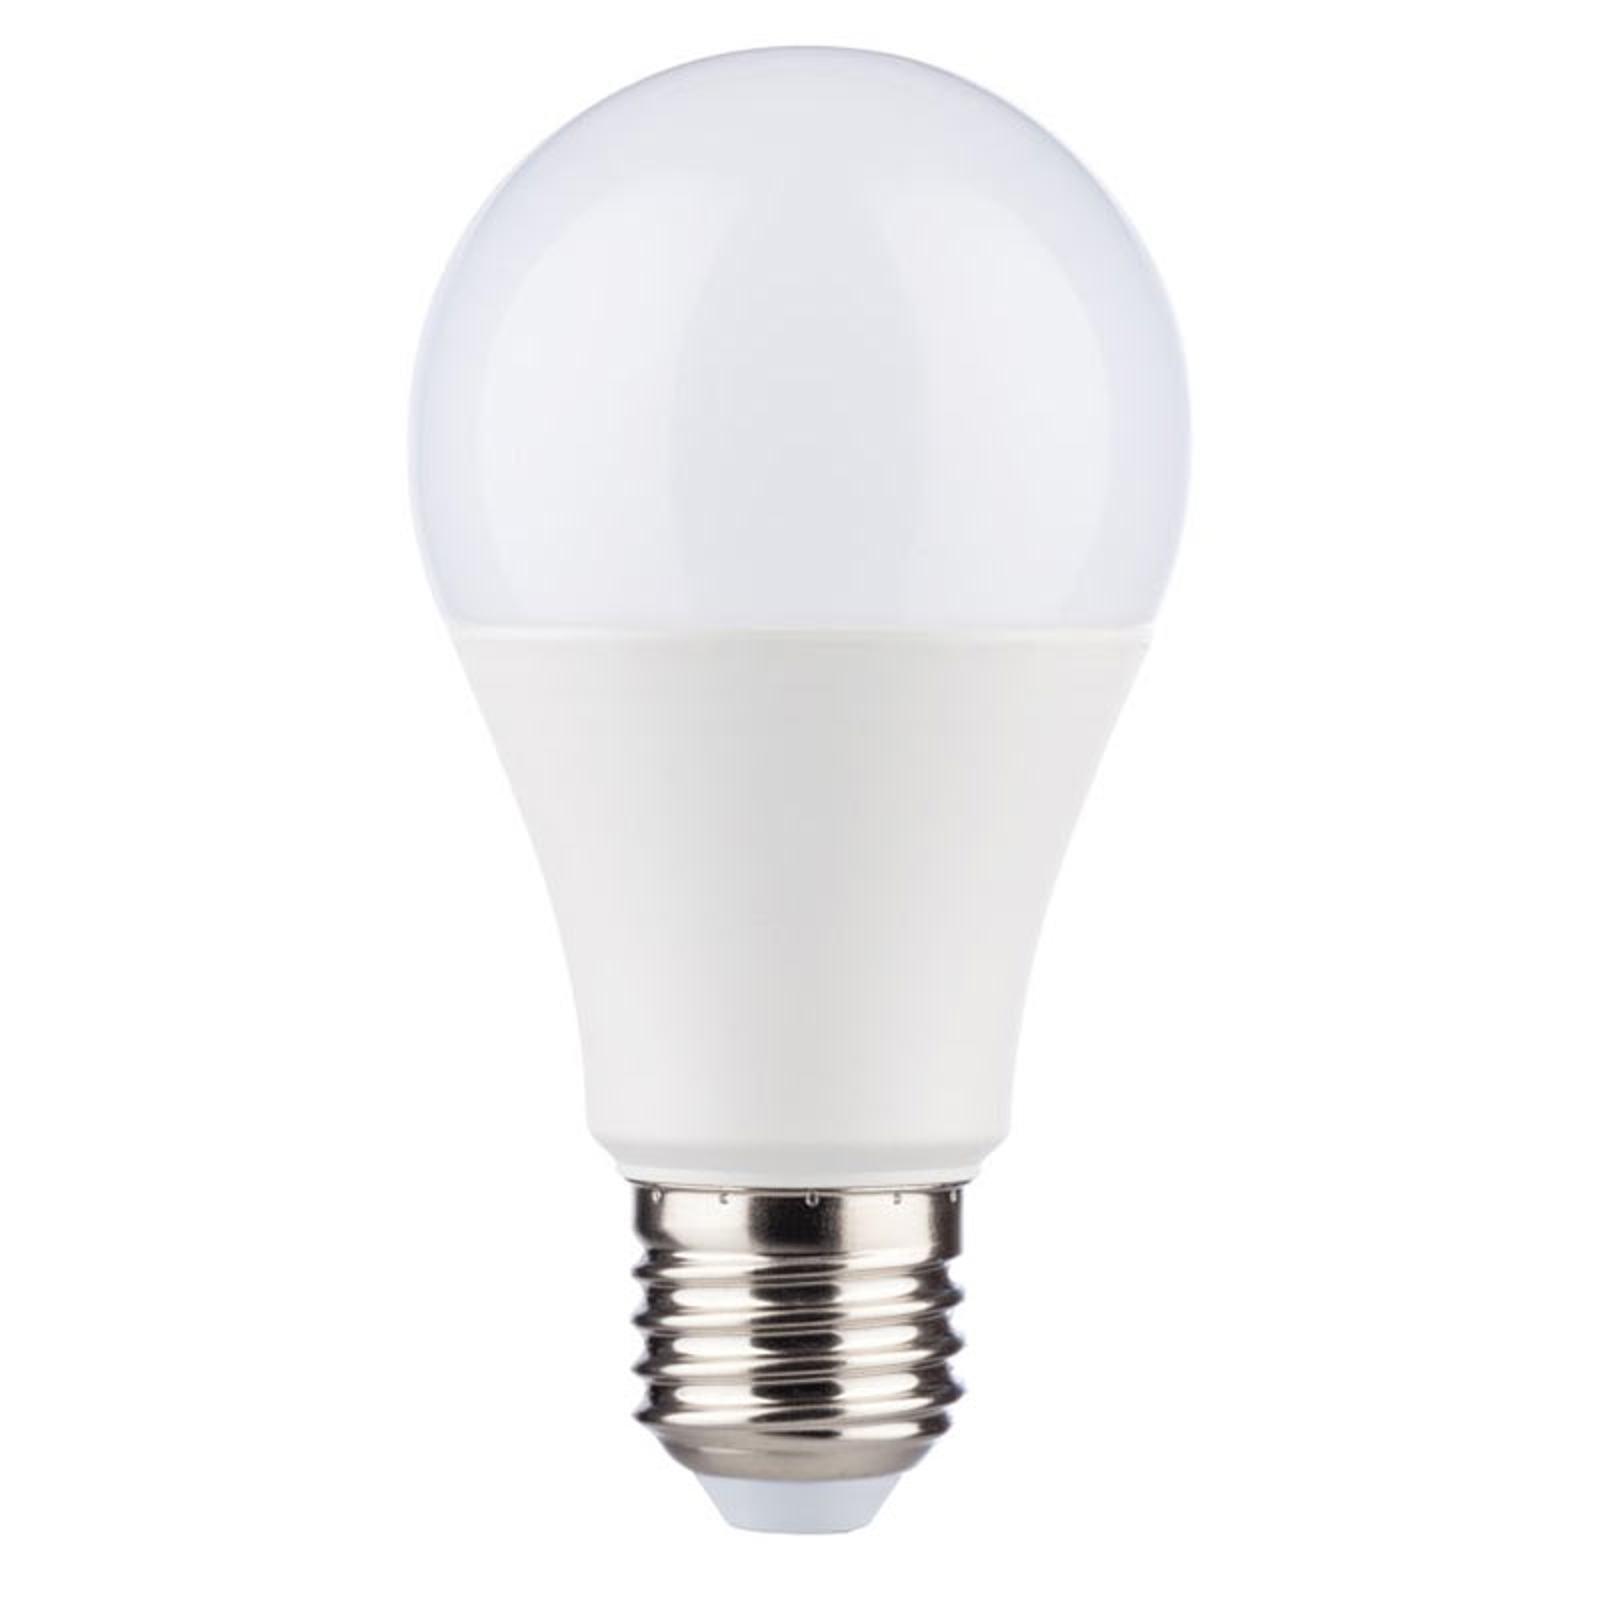 LED-Lampe Birne E27 7 W warmweiß 470 Lumen Ra 95